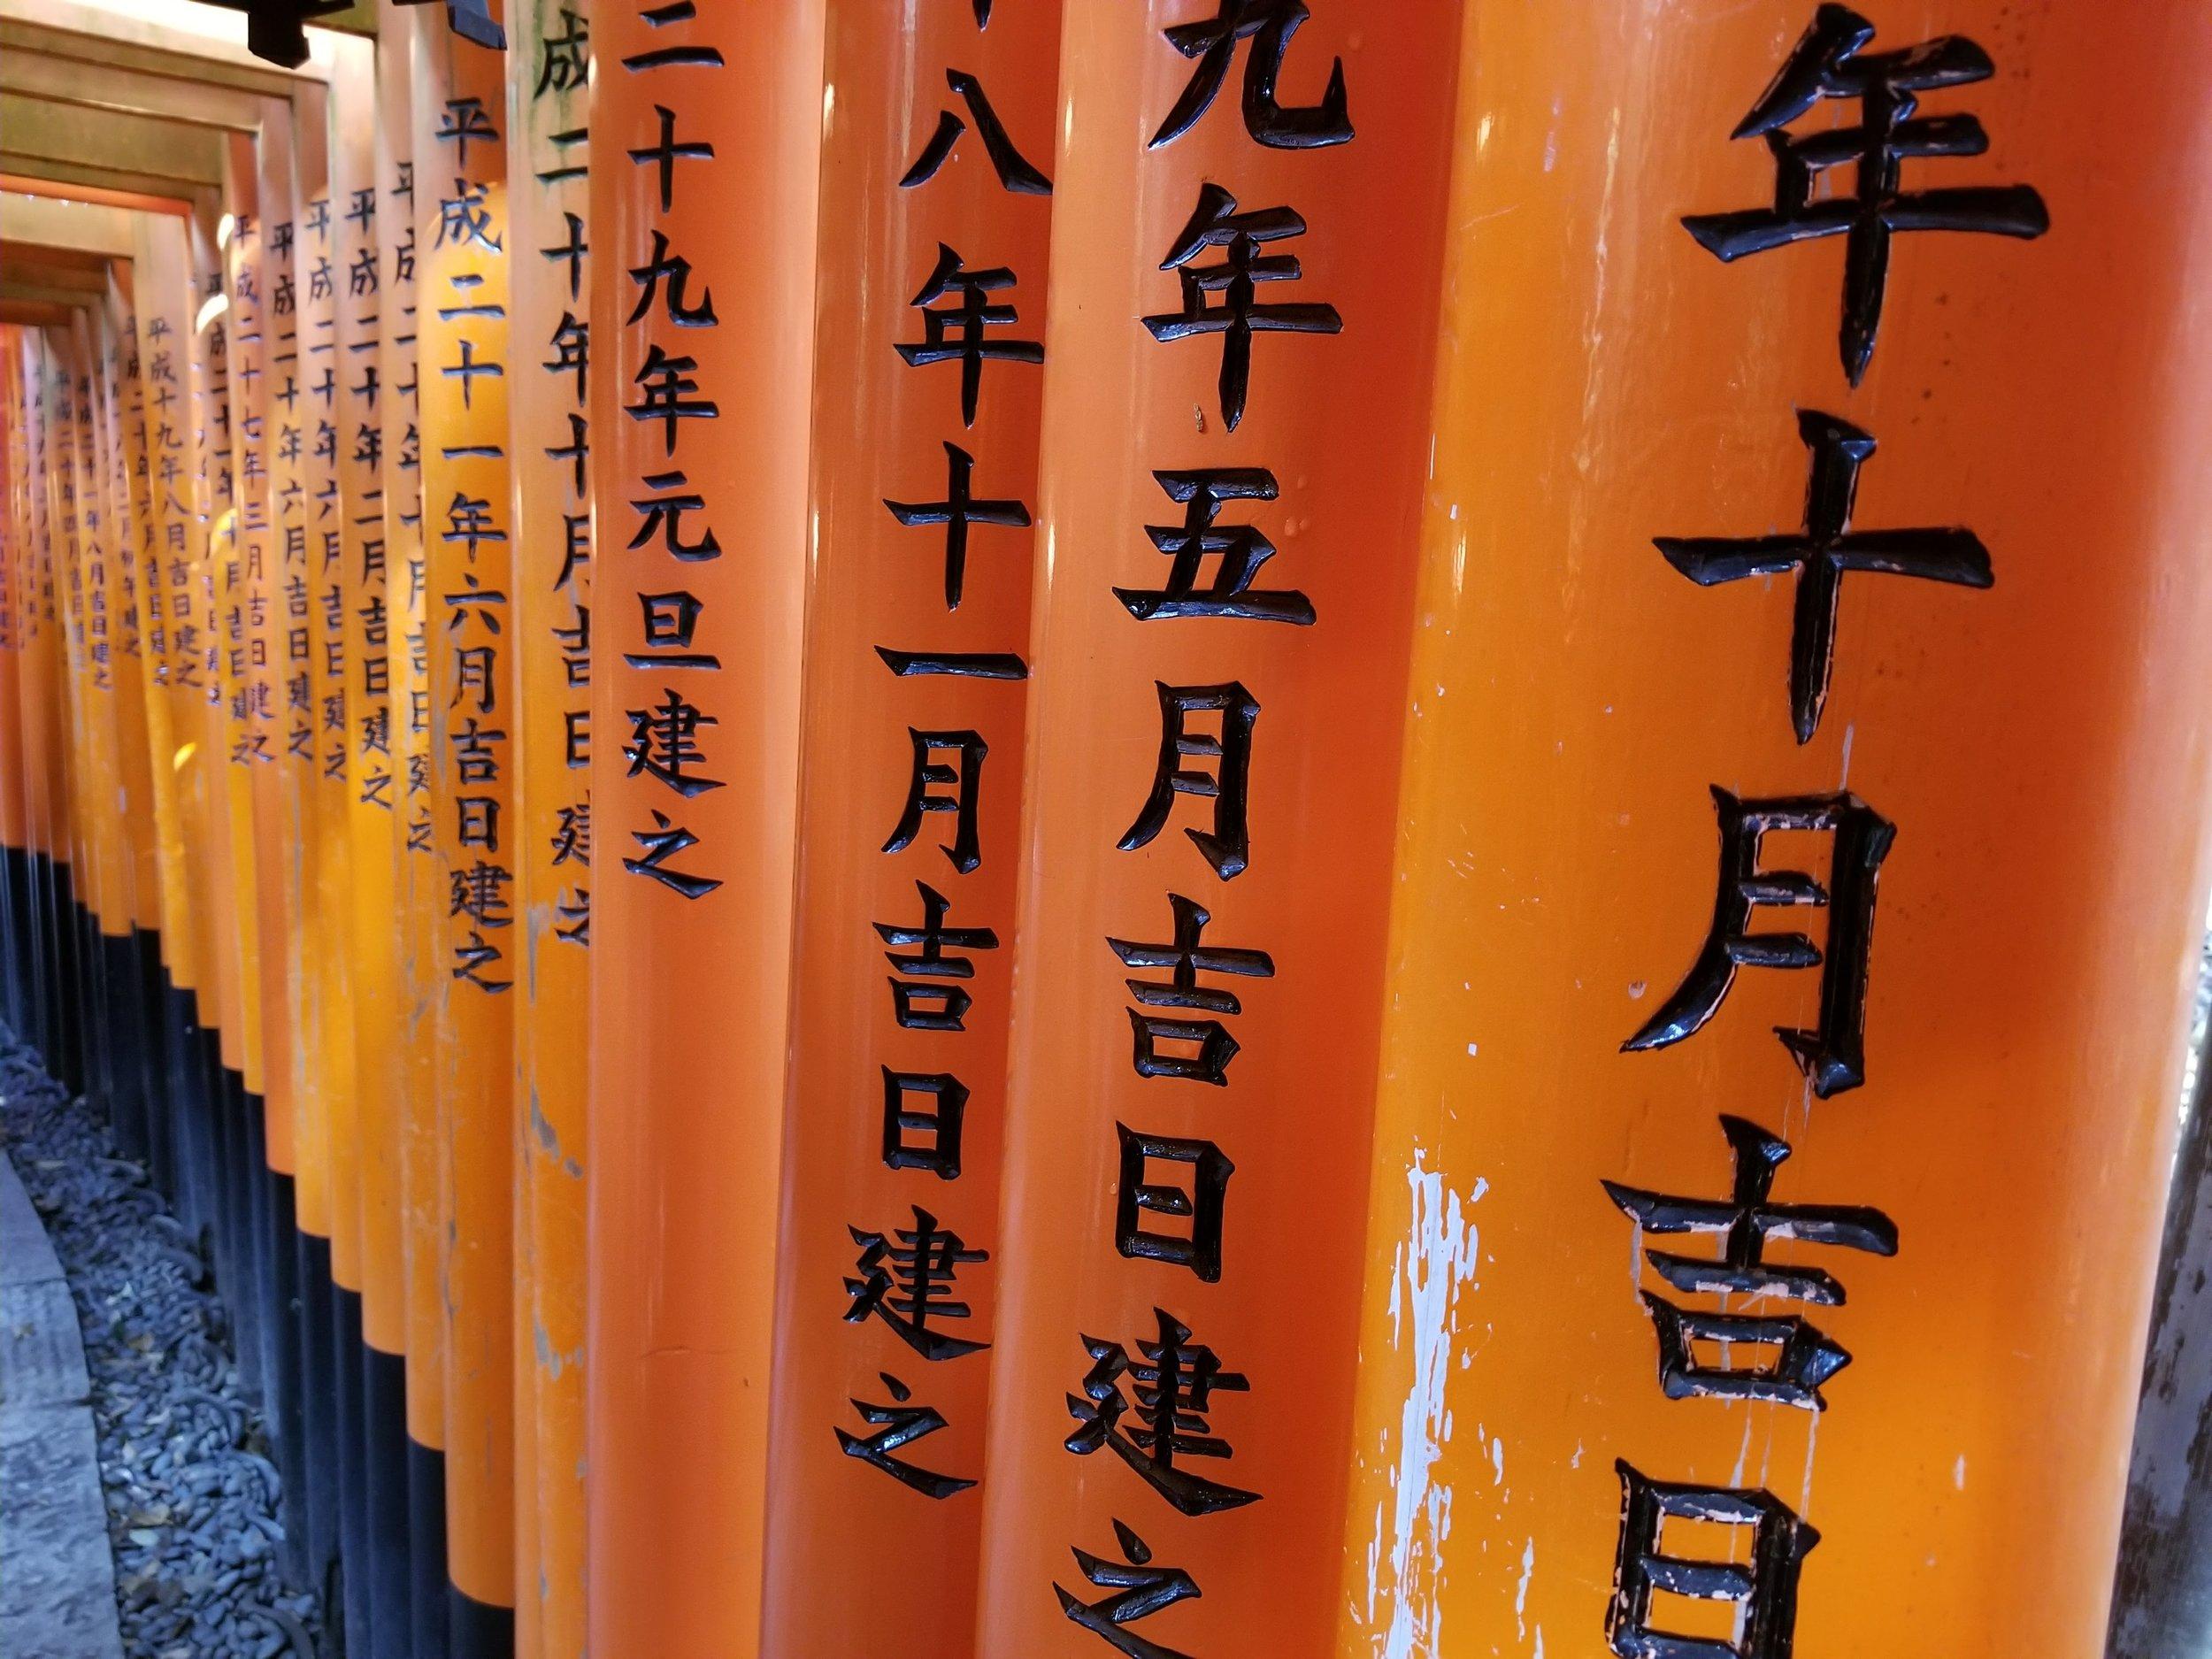 uprooted-traveler-fushimi-inari-shrine-vegan-guide-kyoto